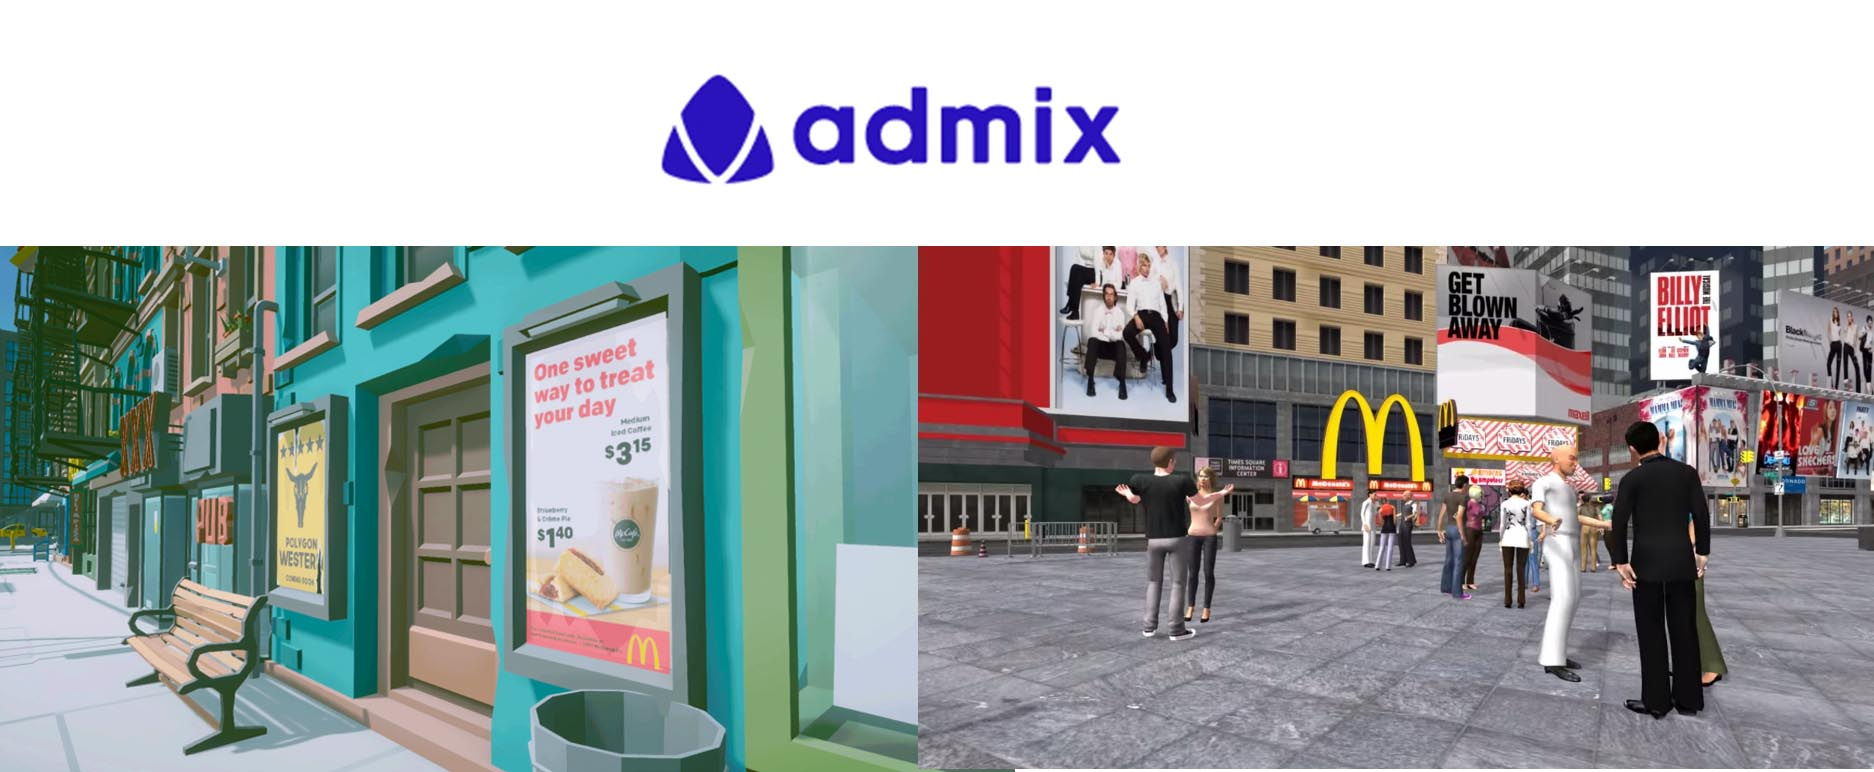 admix1